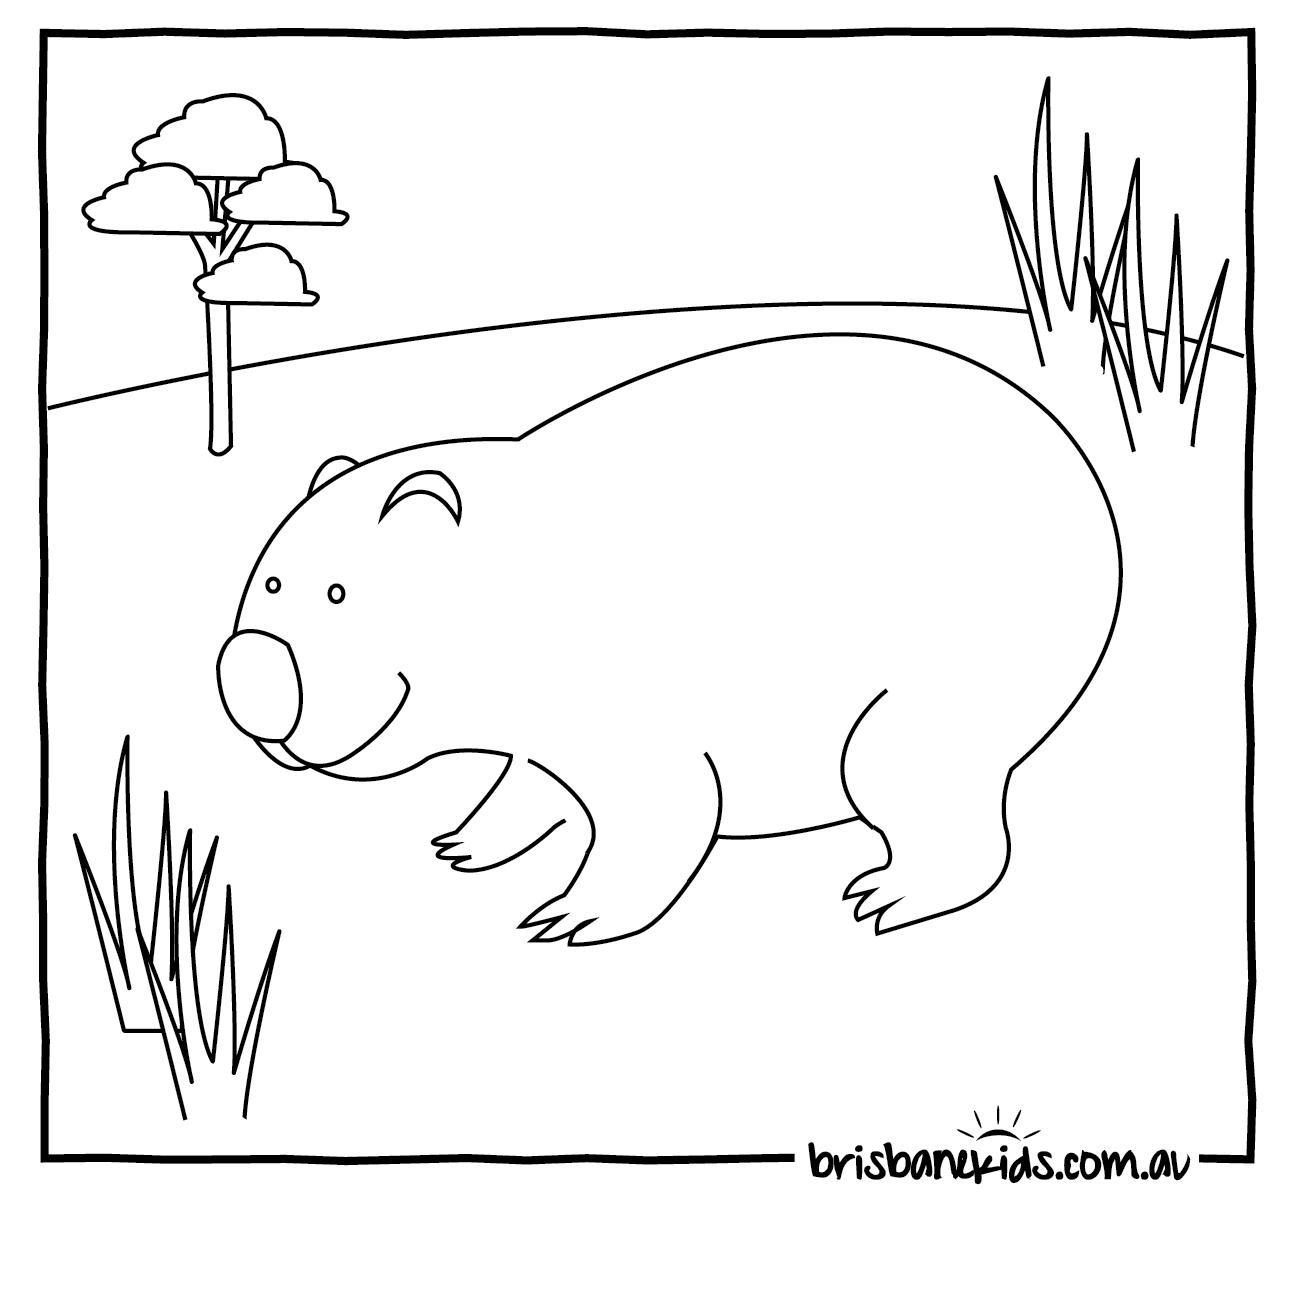 Wombat Coloring Download Wombat Coloring